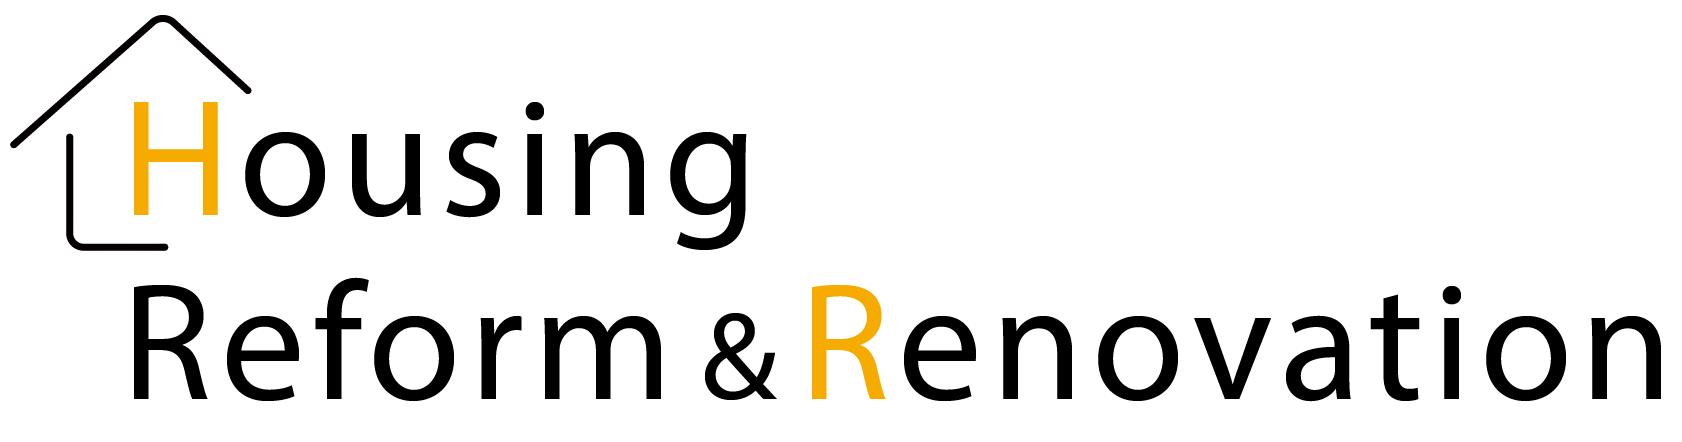 Housing Reform & Renovation